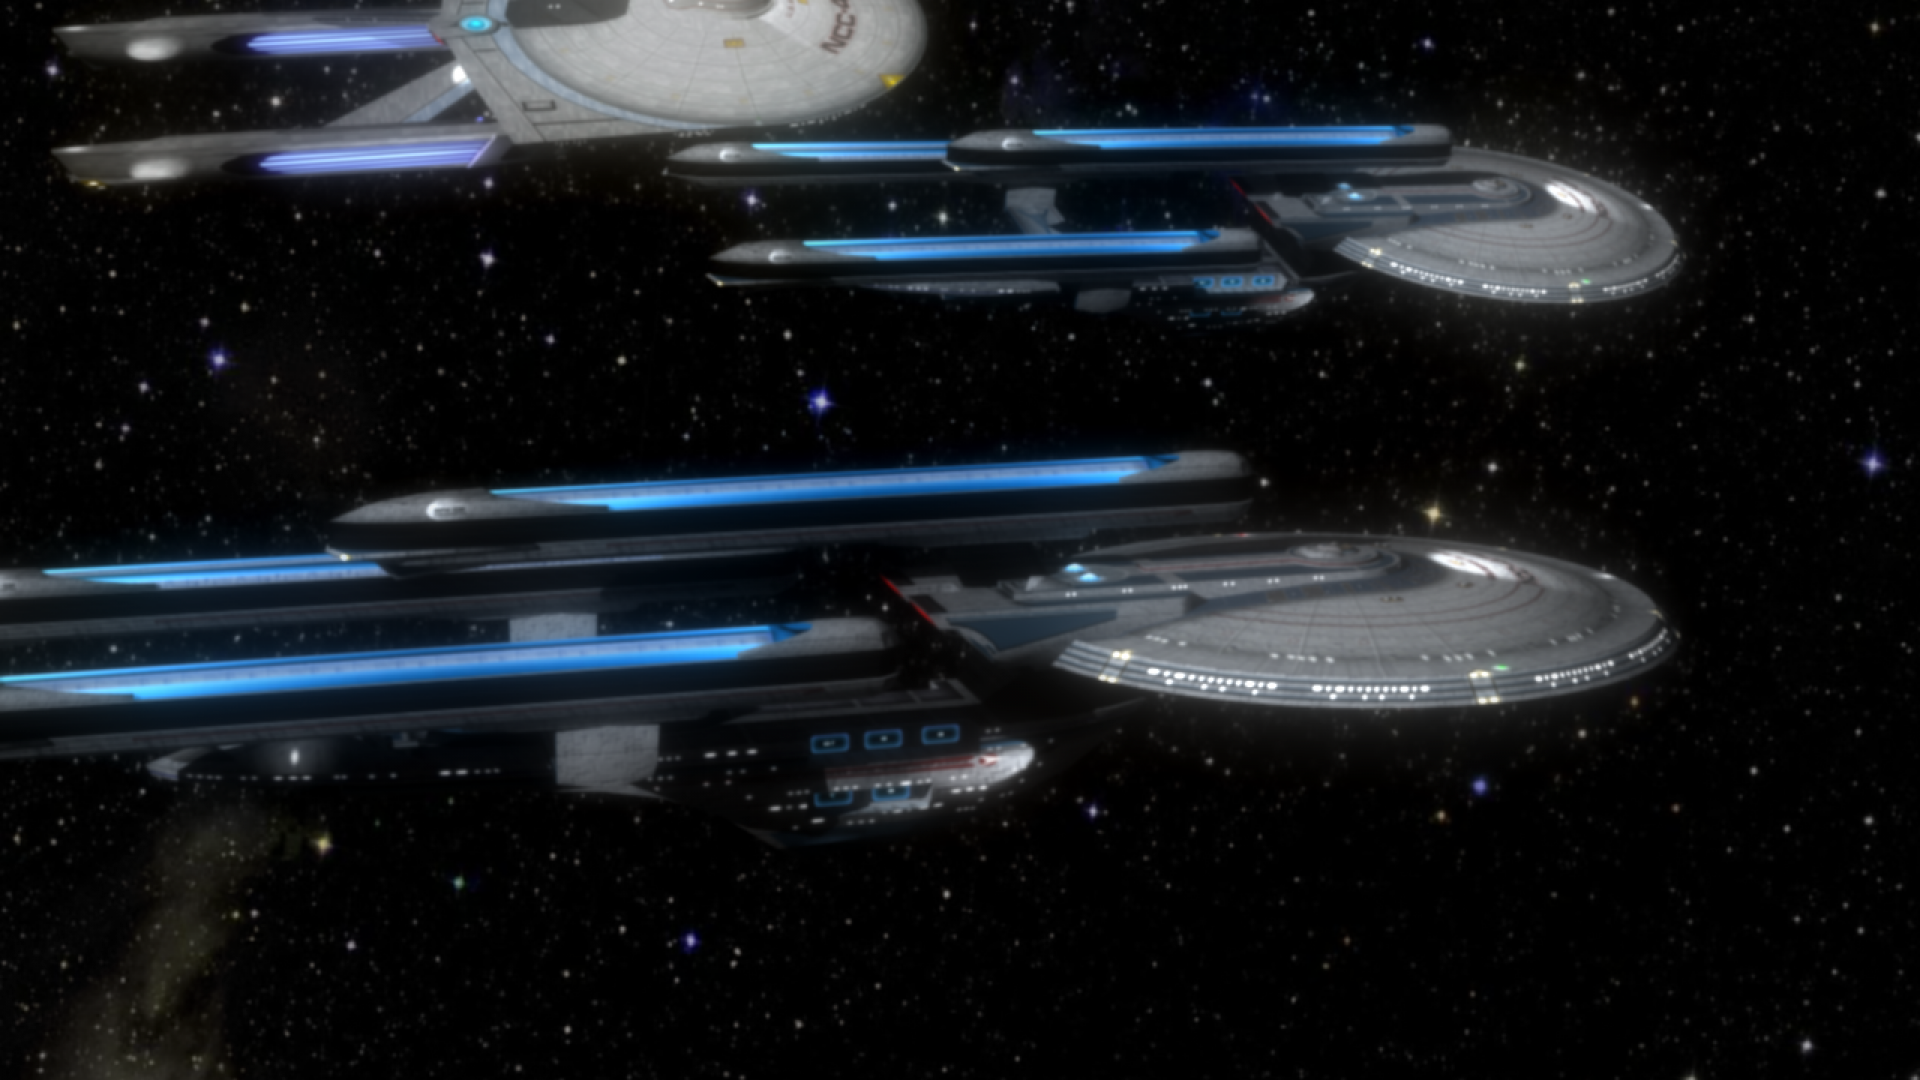 Star Trek vs. Star Wars: Let's Talk